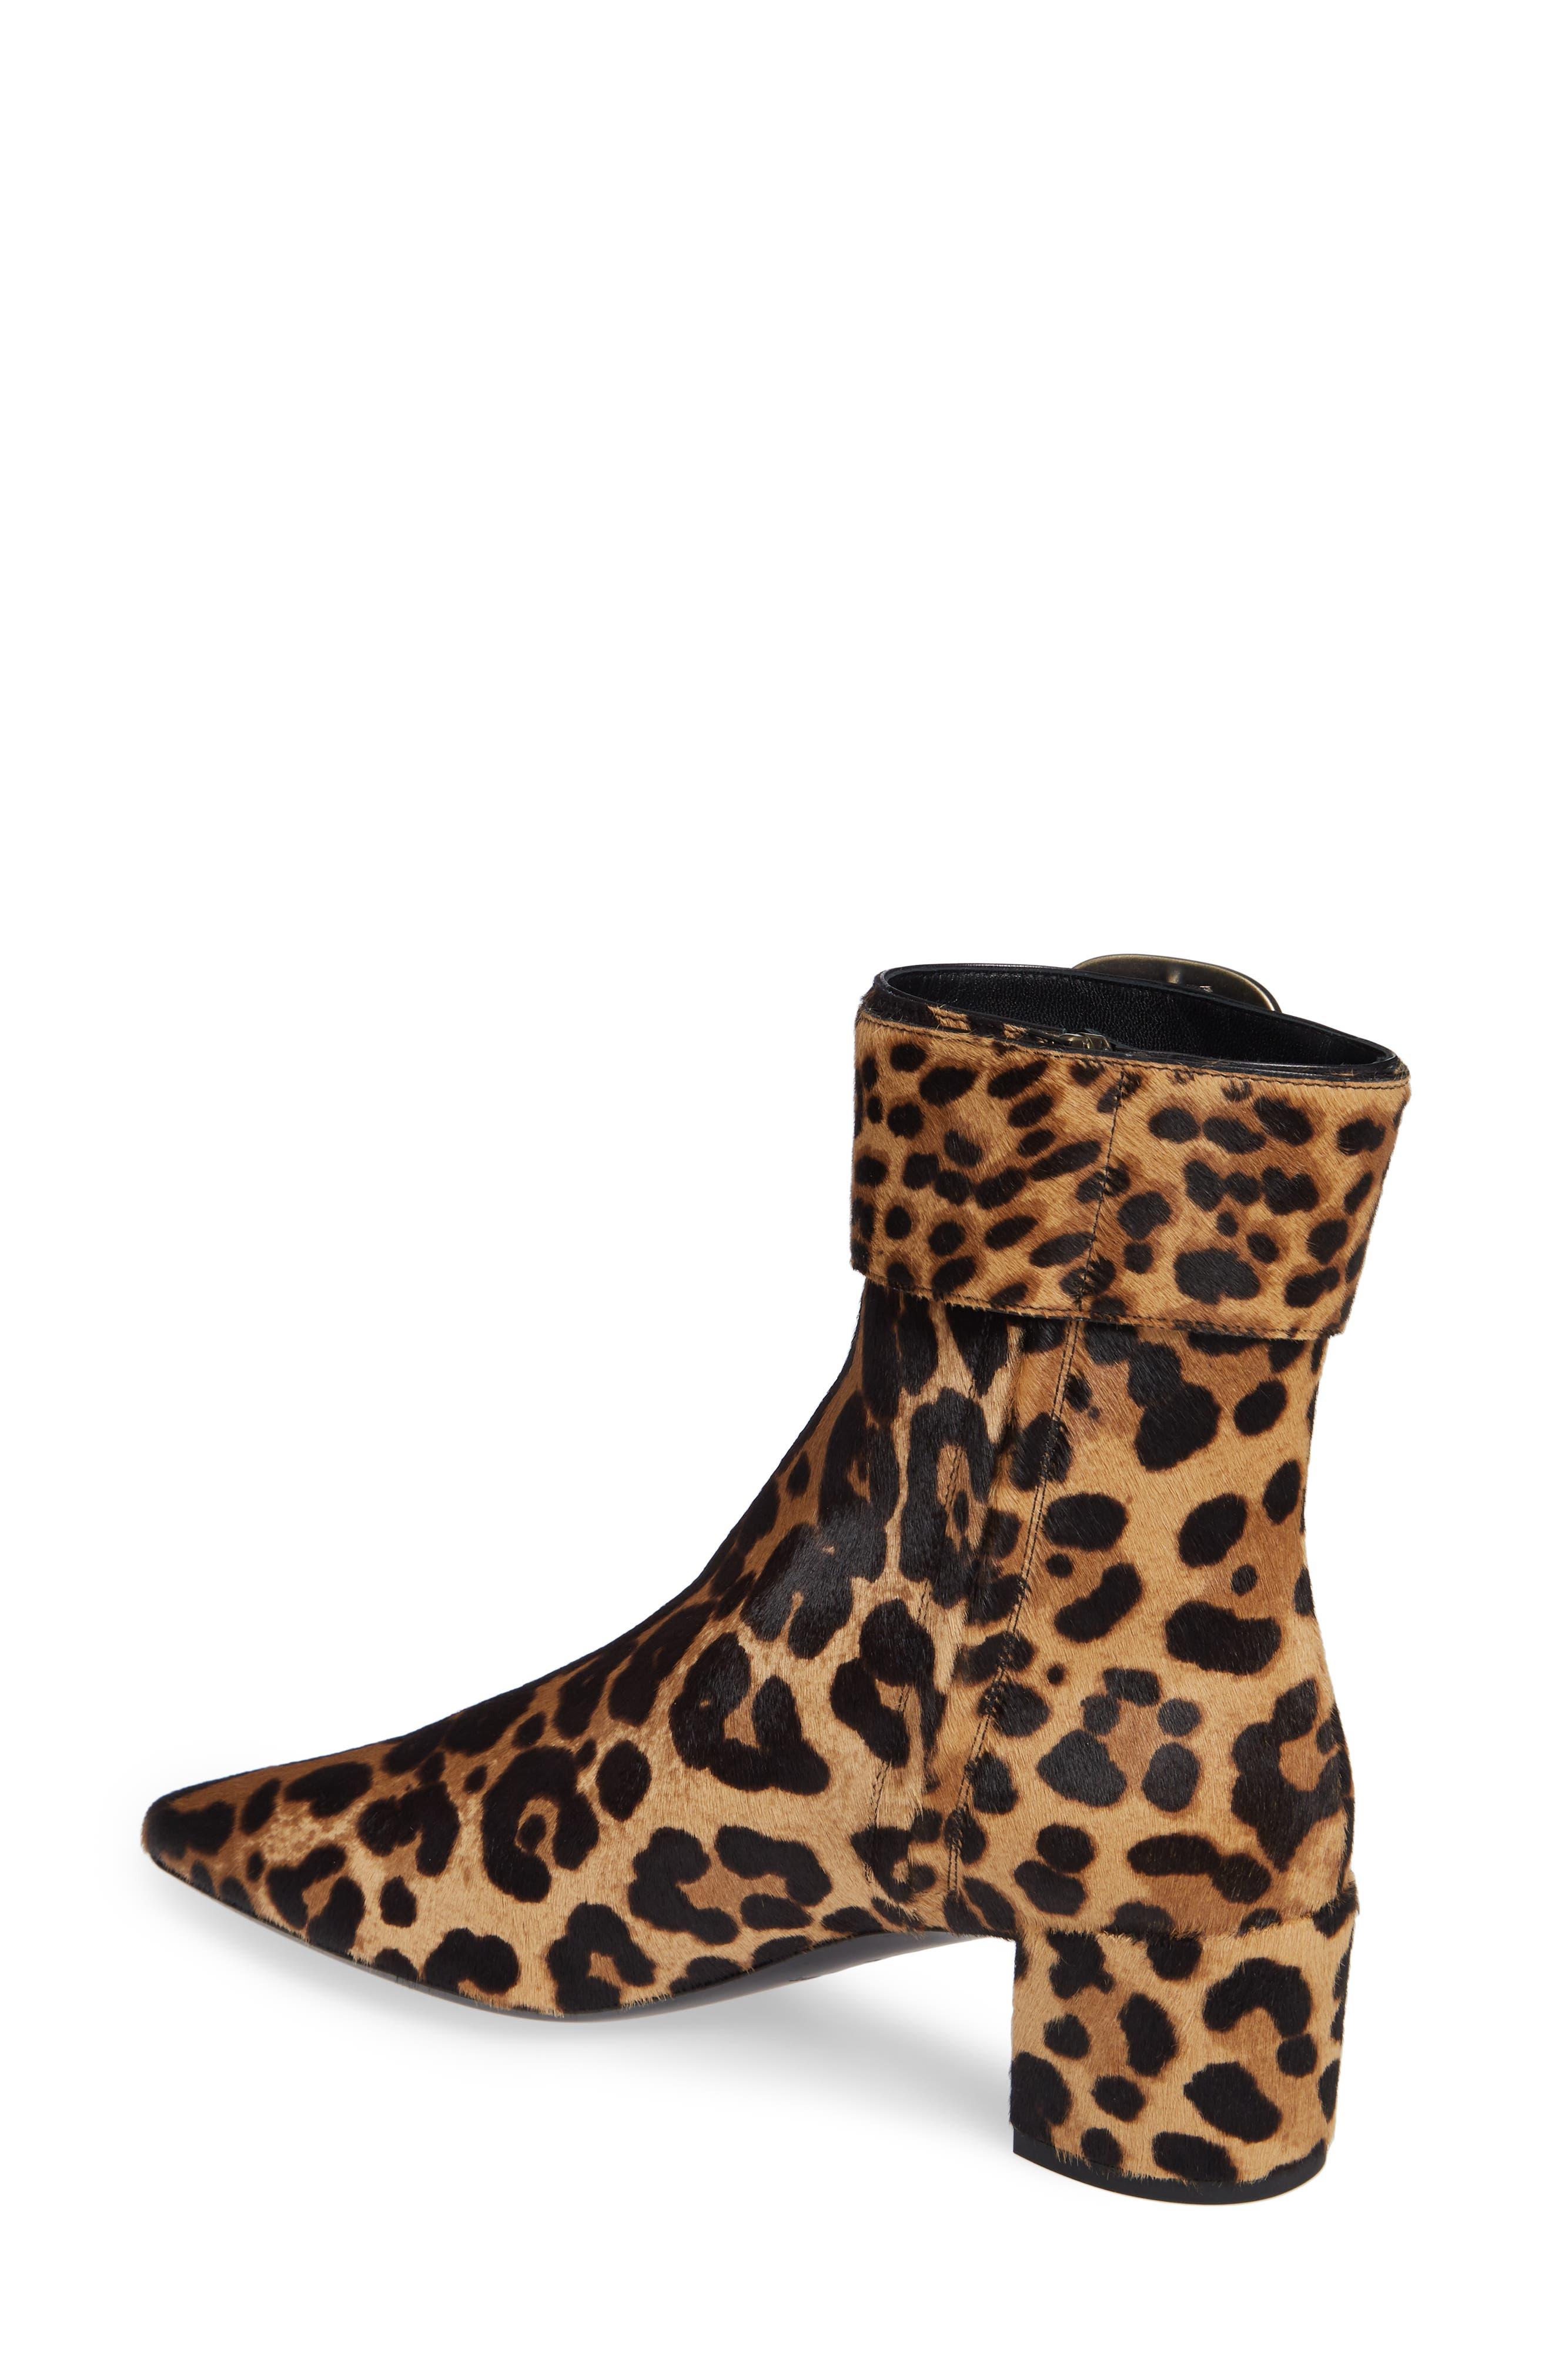 Leopard Genuine Calf Hair Buckle Bootie,                             Alternate thumbnail 2, color,                             LEOPARD CALF HAIR